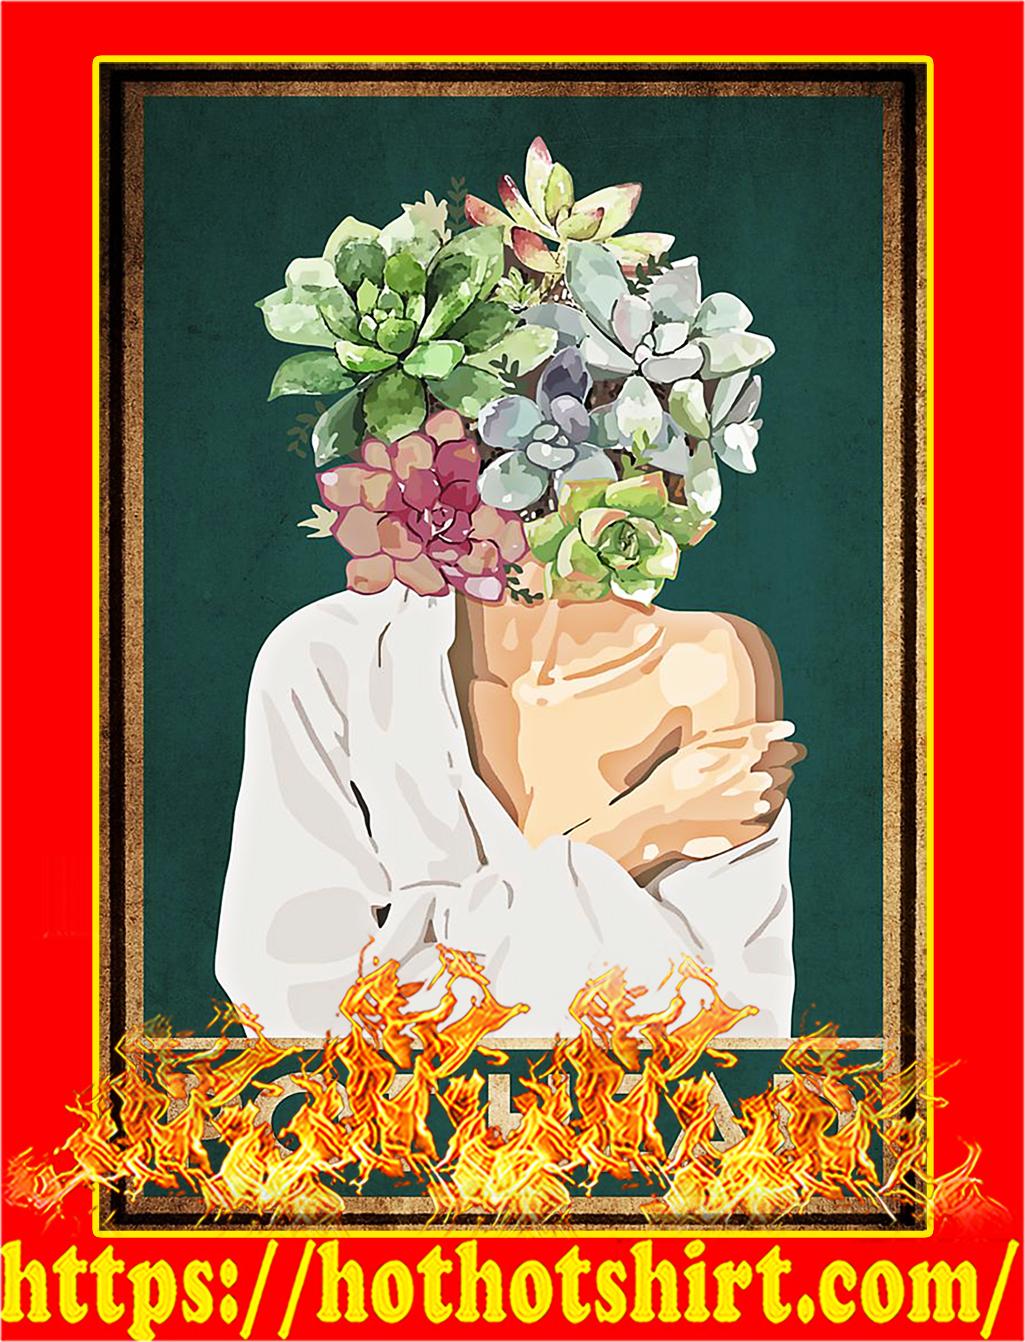 Pot head garden poster - A3